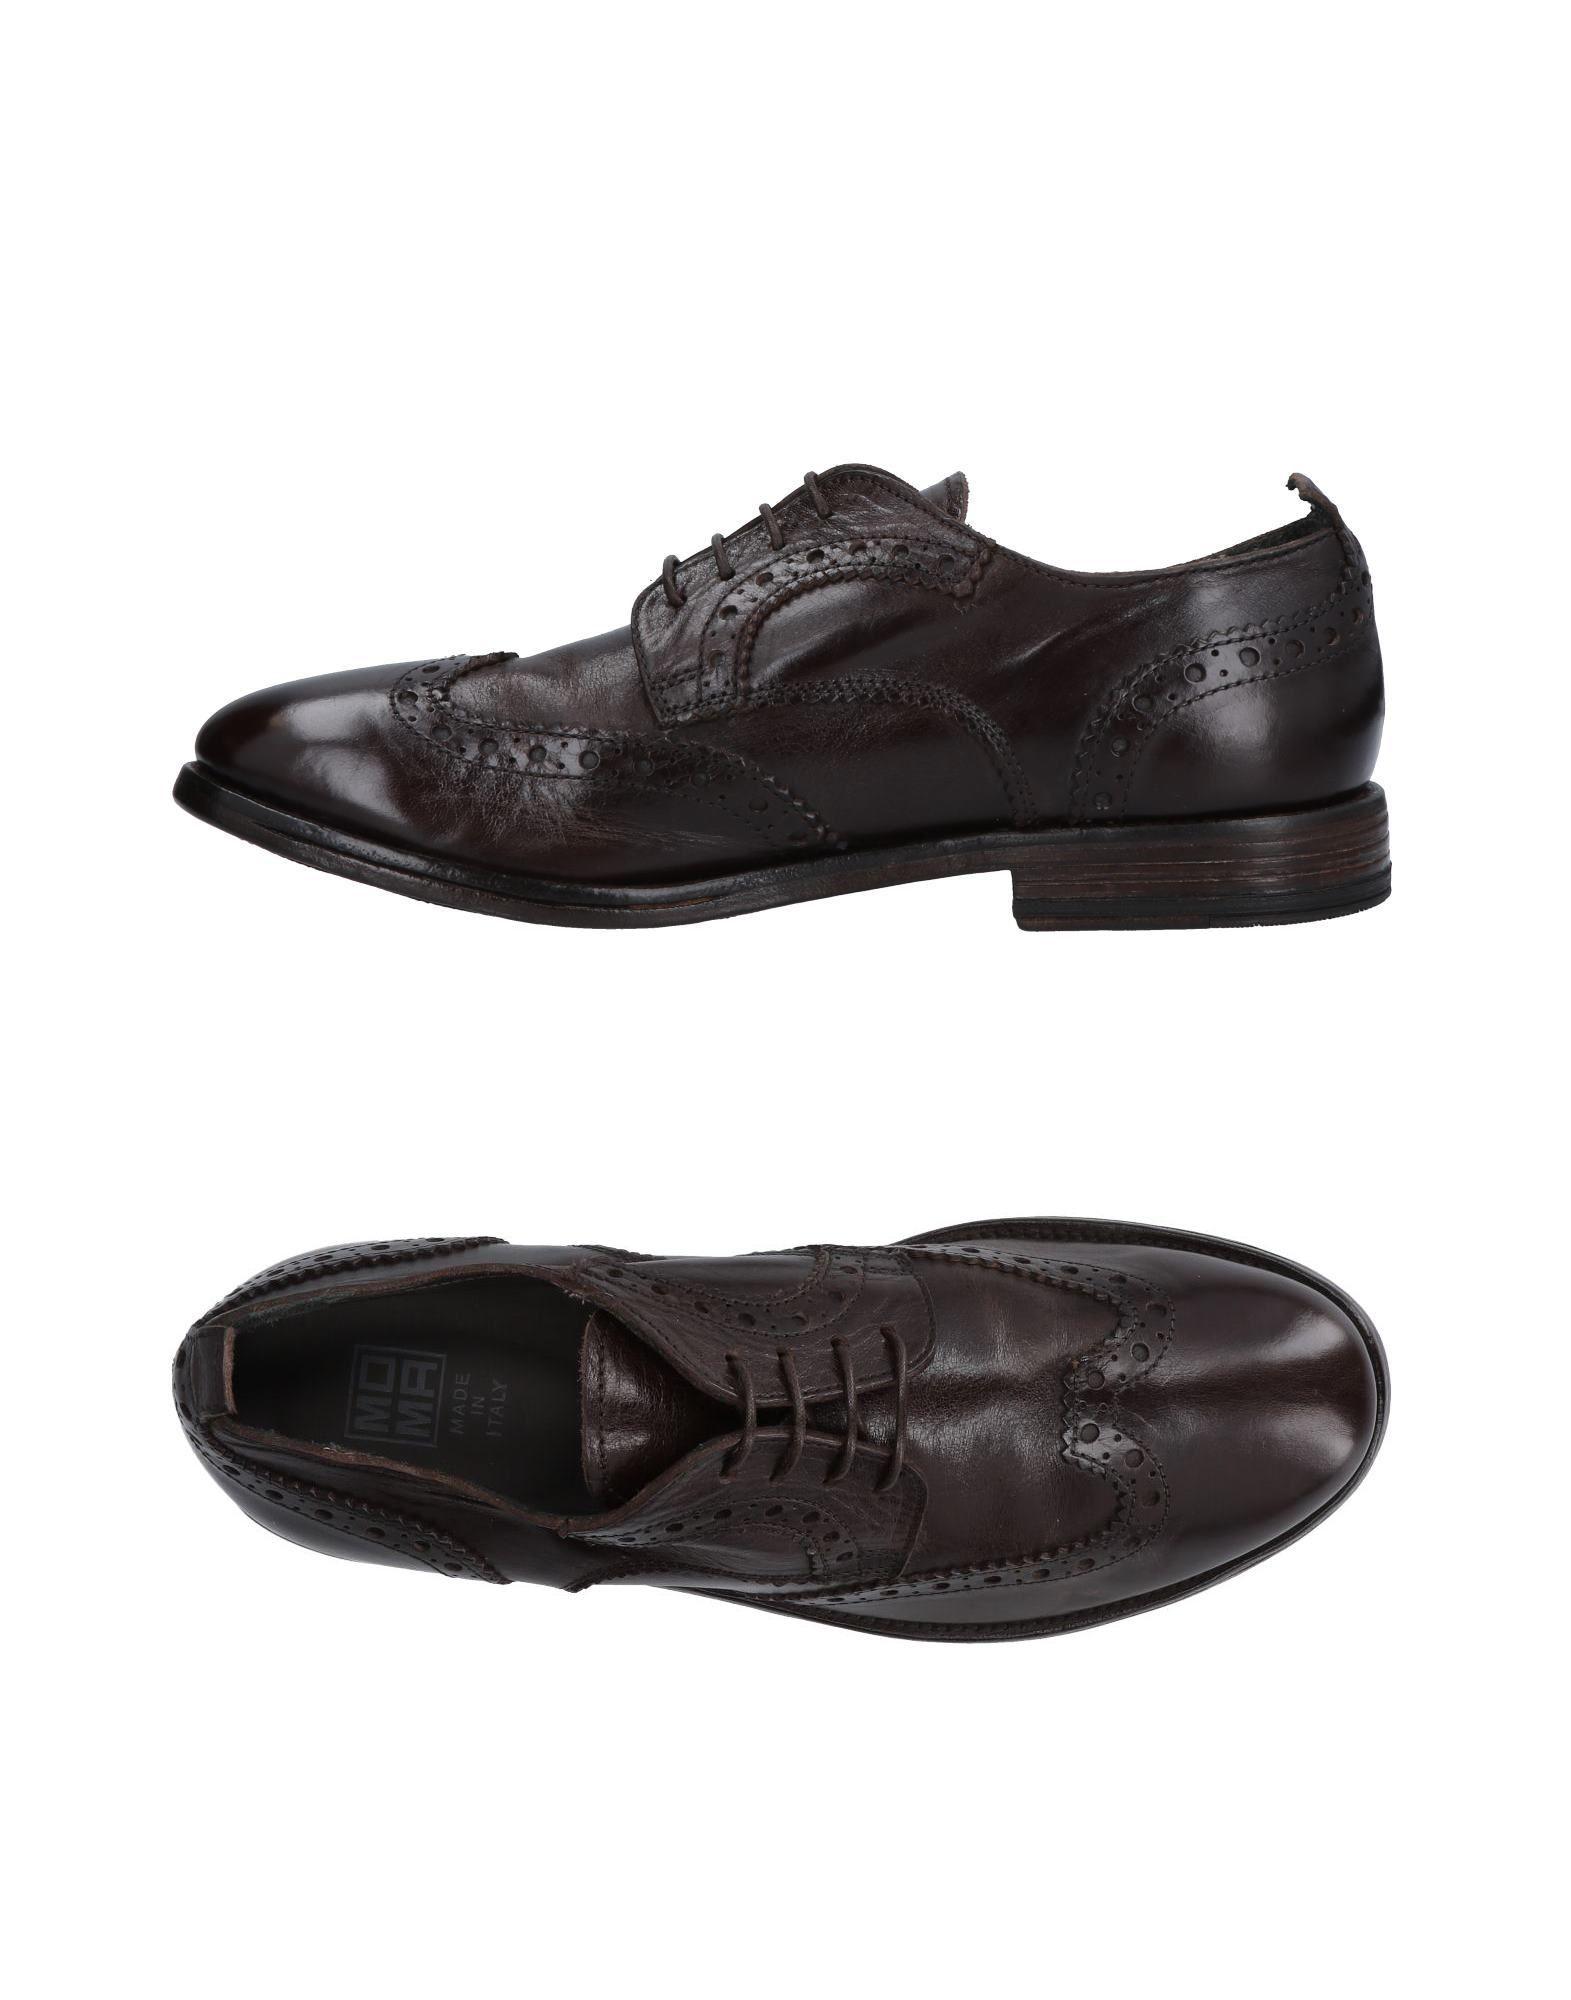 Moma Schnürschuhe Herren  Schuhe 11471407UU Gute Qualität beliebte Schuhe  cc4b17